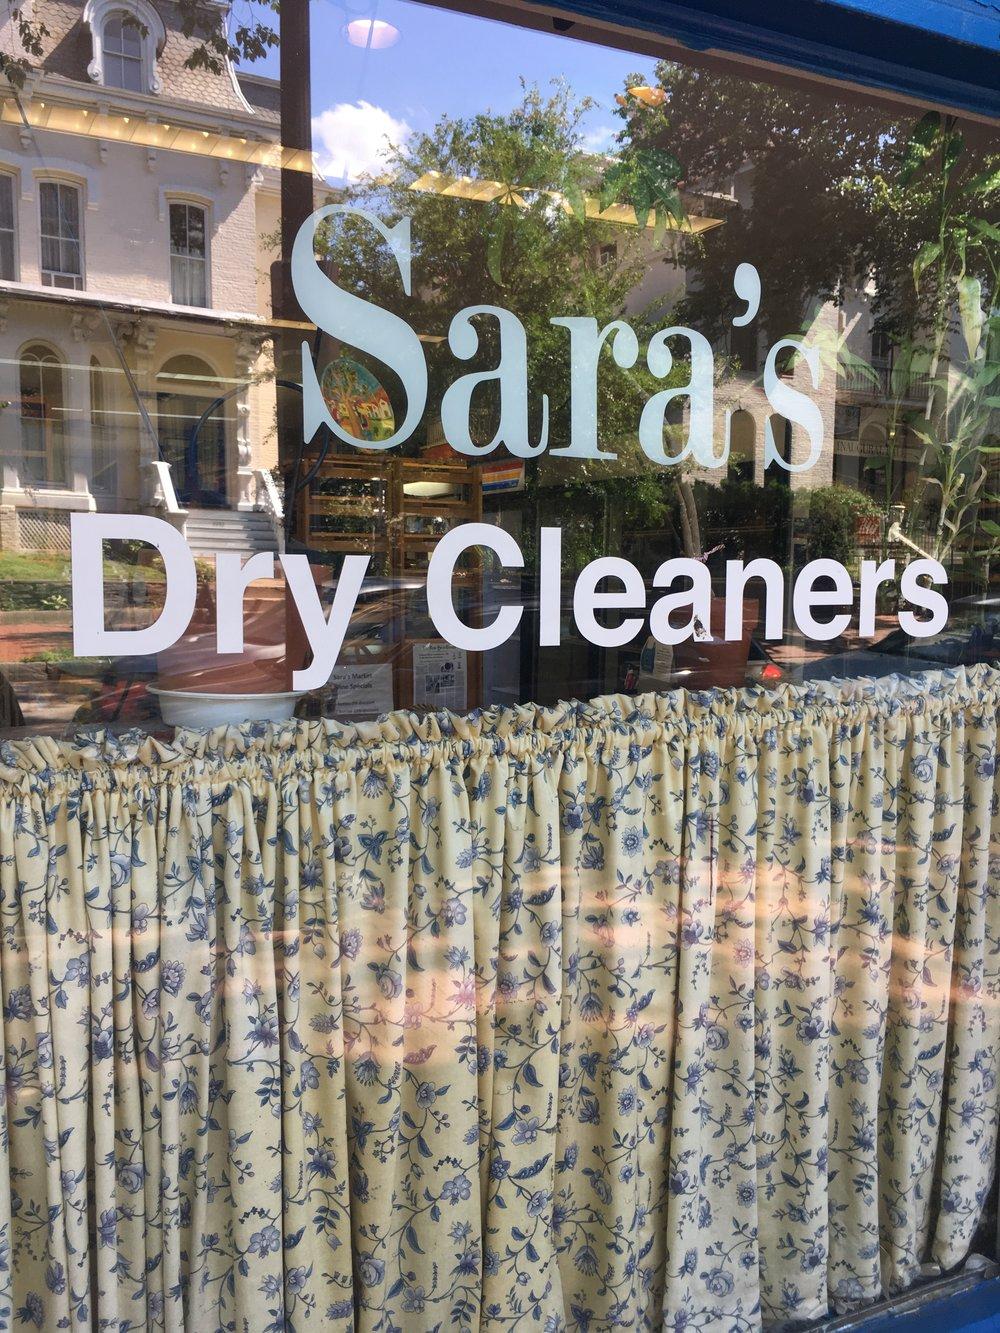 Sara's Dry Cleaners